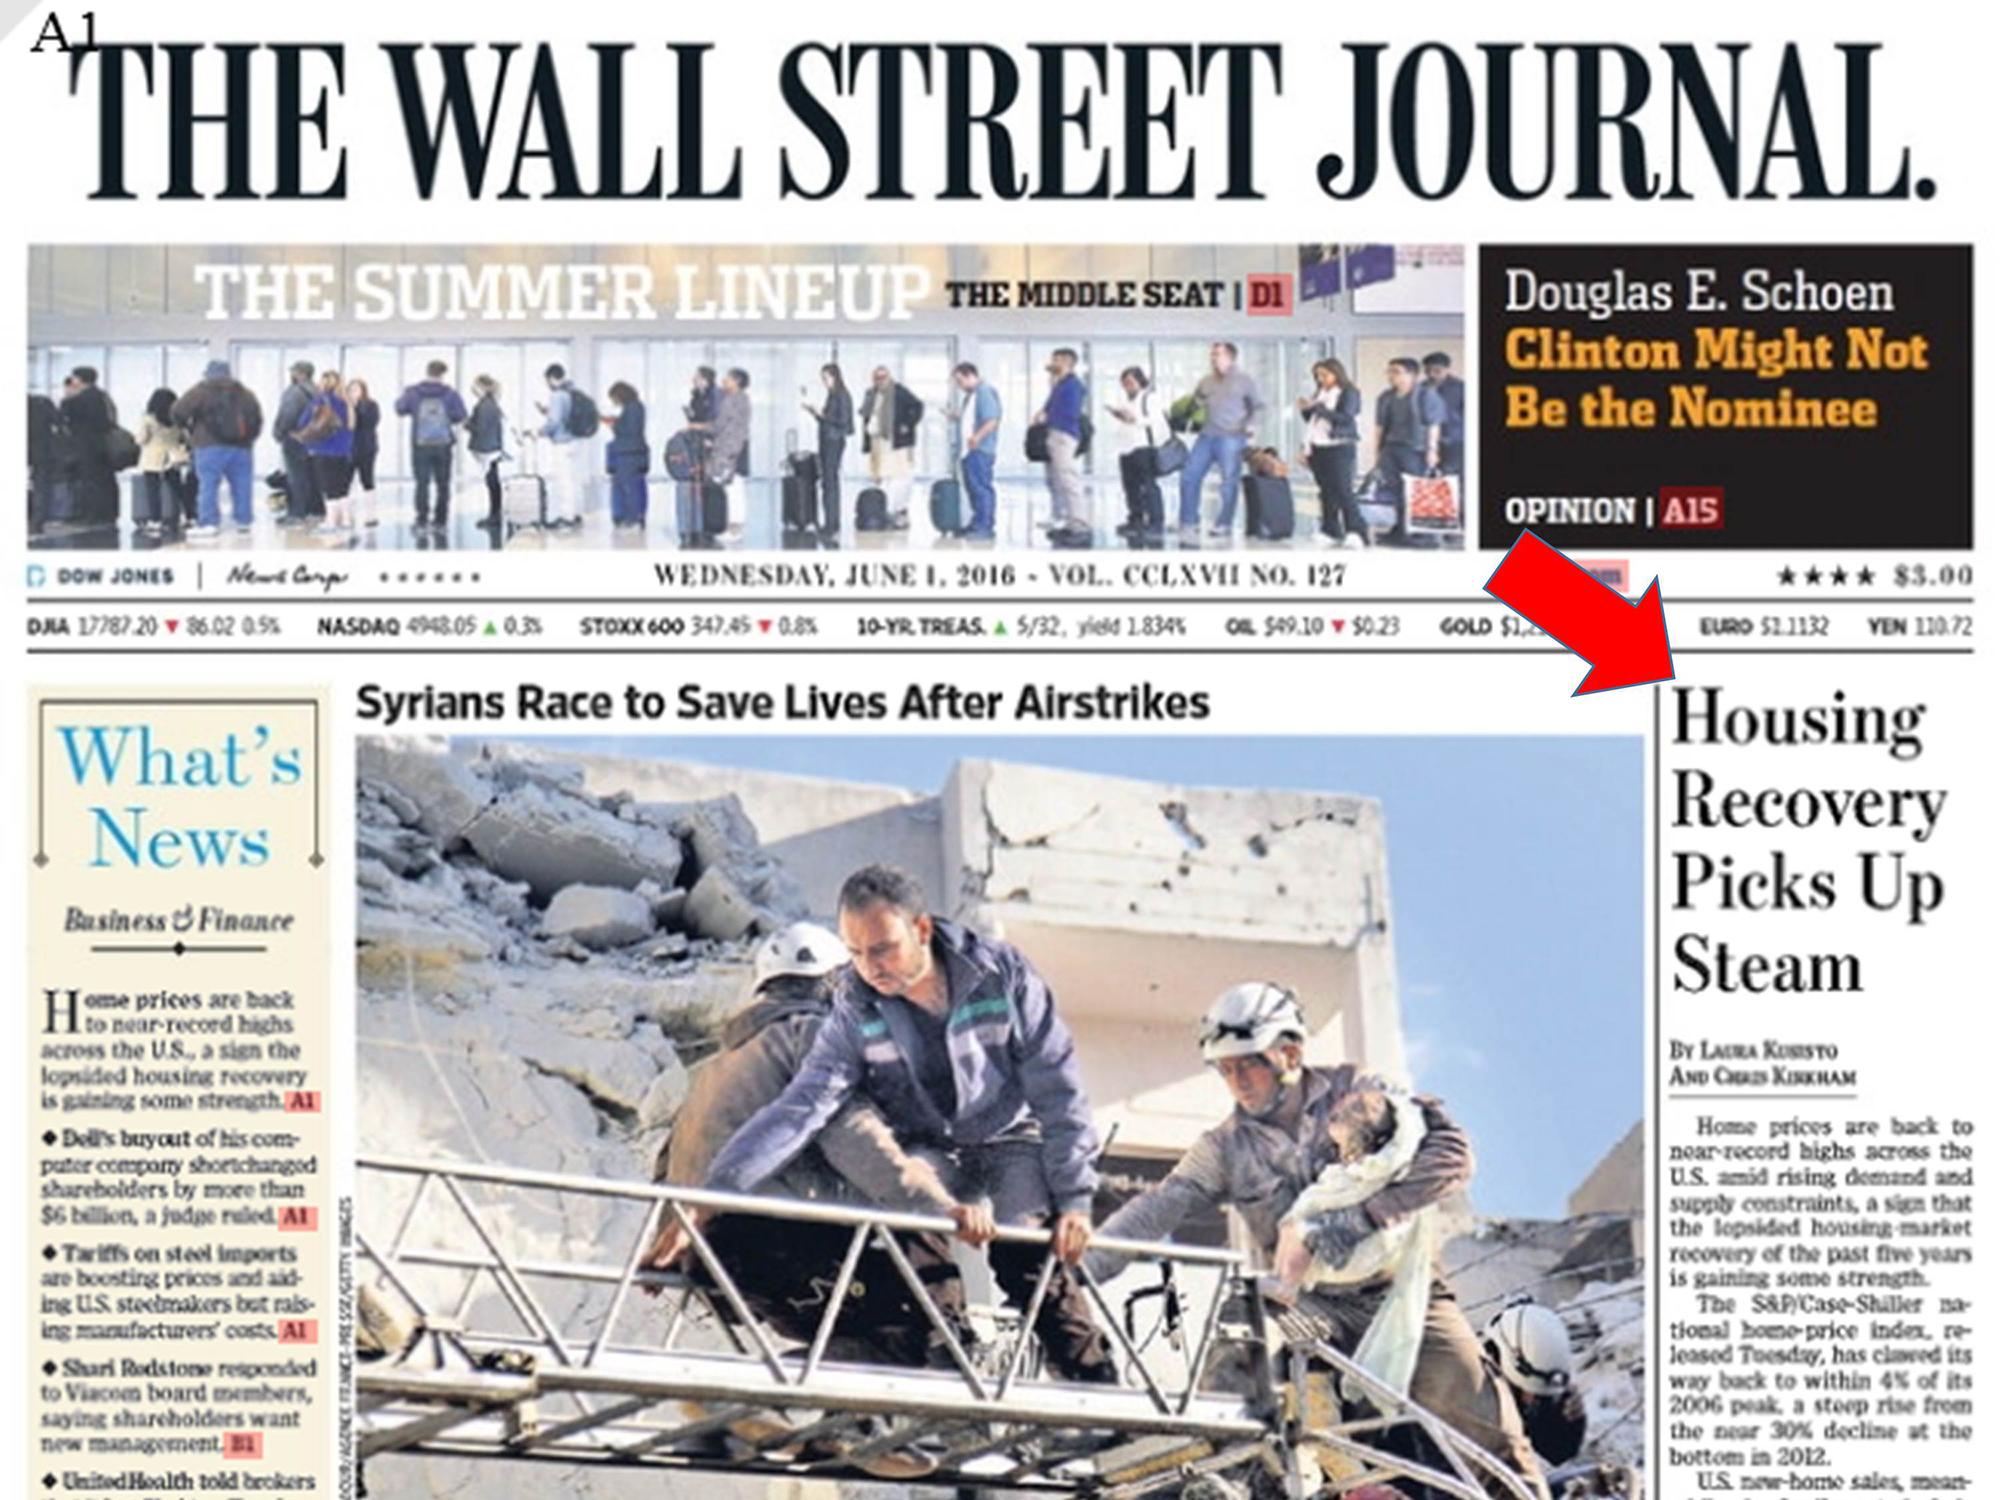 Wall Street Journal: Housing Recovery Picks Up Steam   Keeping Current Matters